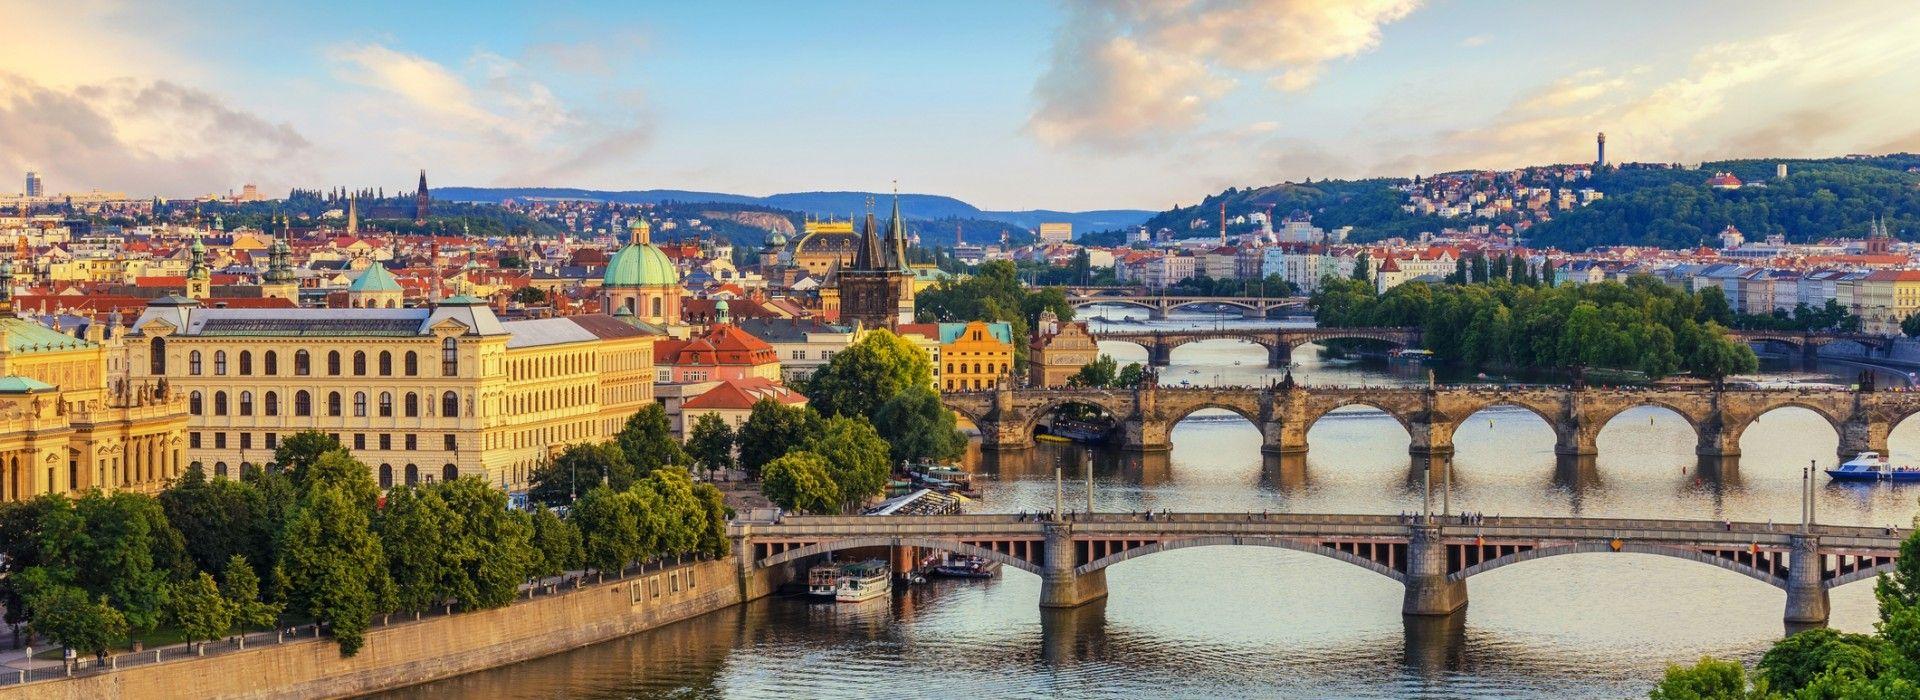 City sightseeing Tours in Prague